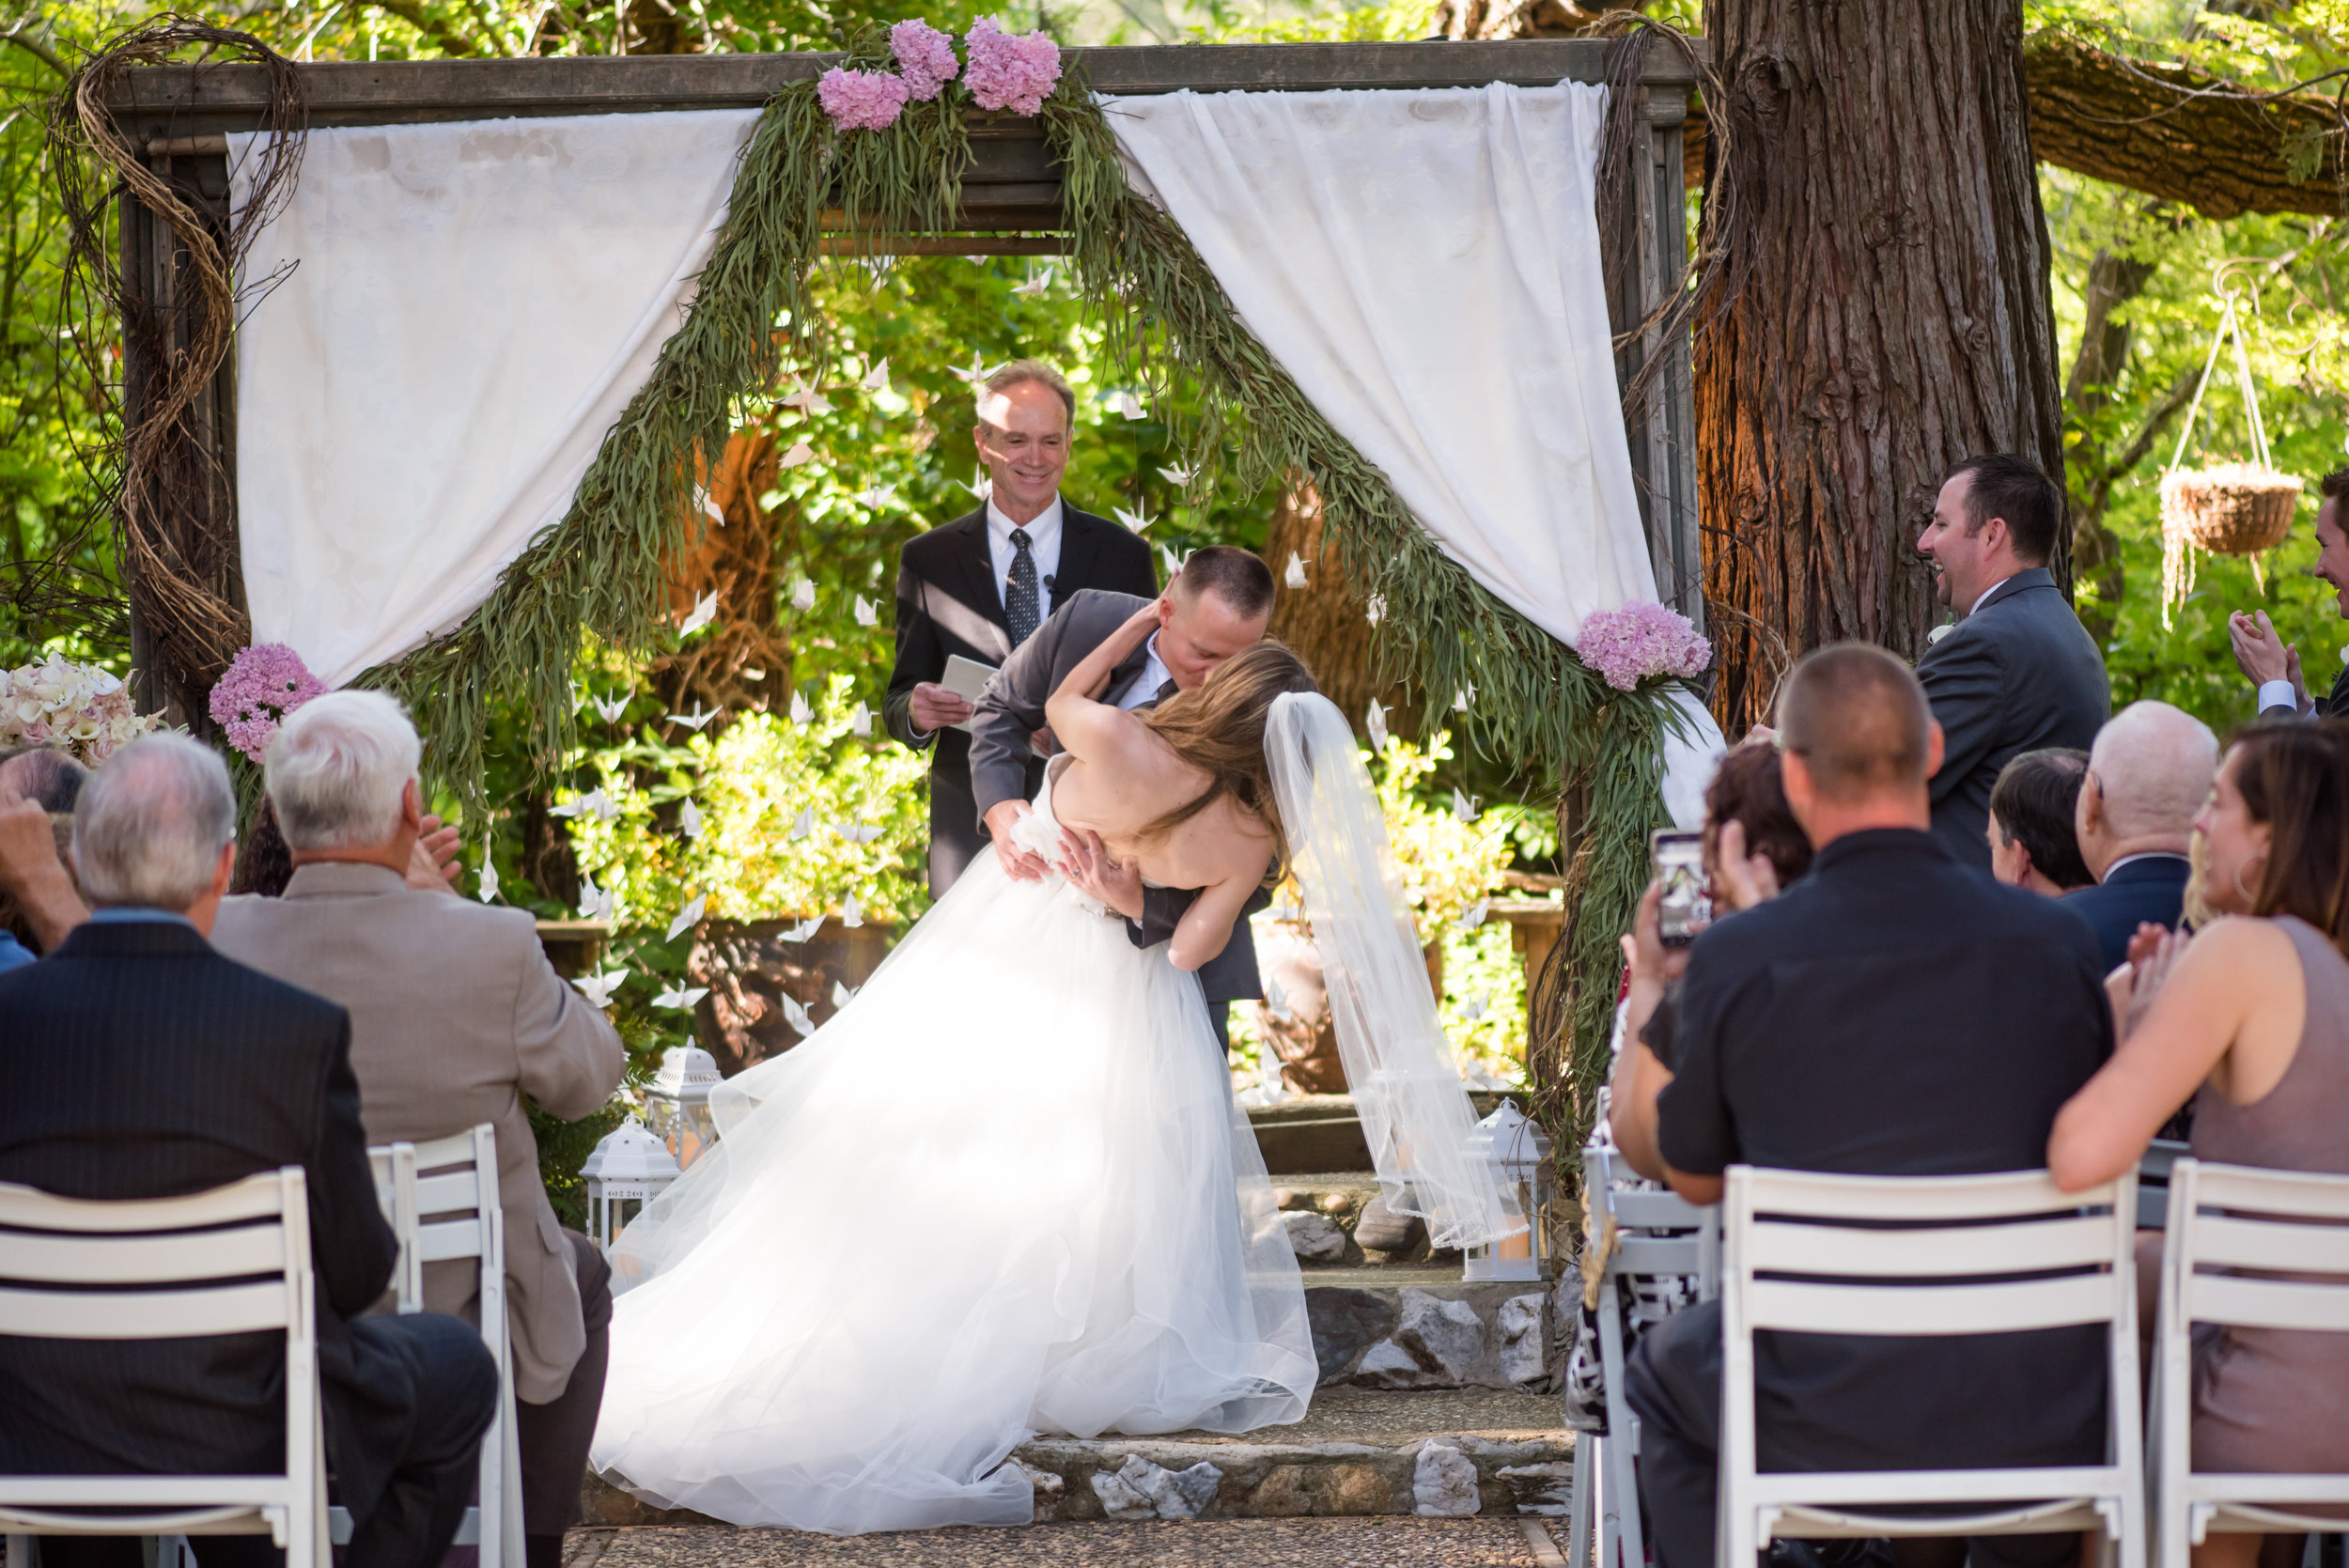 nicole-luke-023-onte-verde-inn-foresthill-wedding-photographer-katherine-nicole-photography.JPG